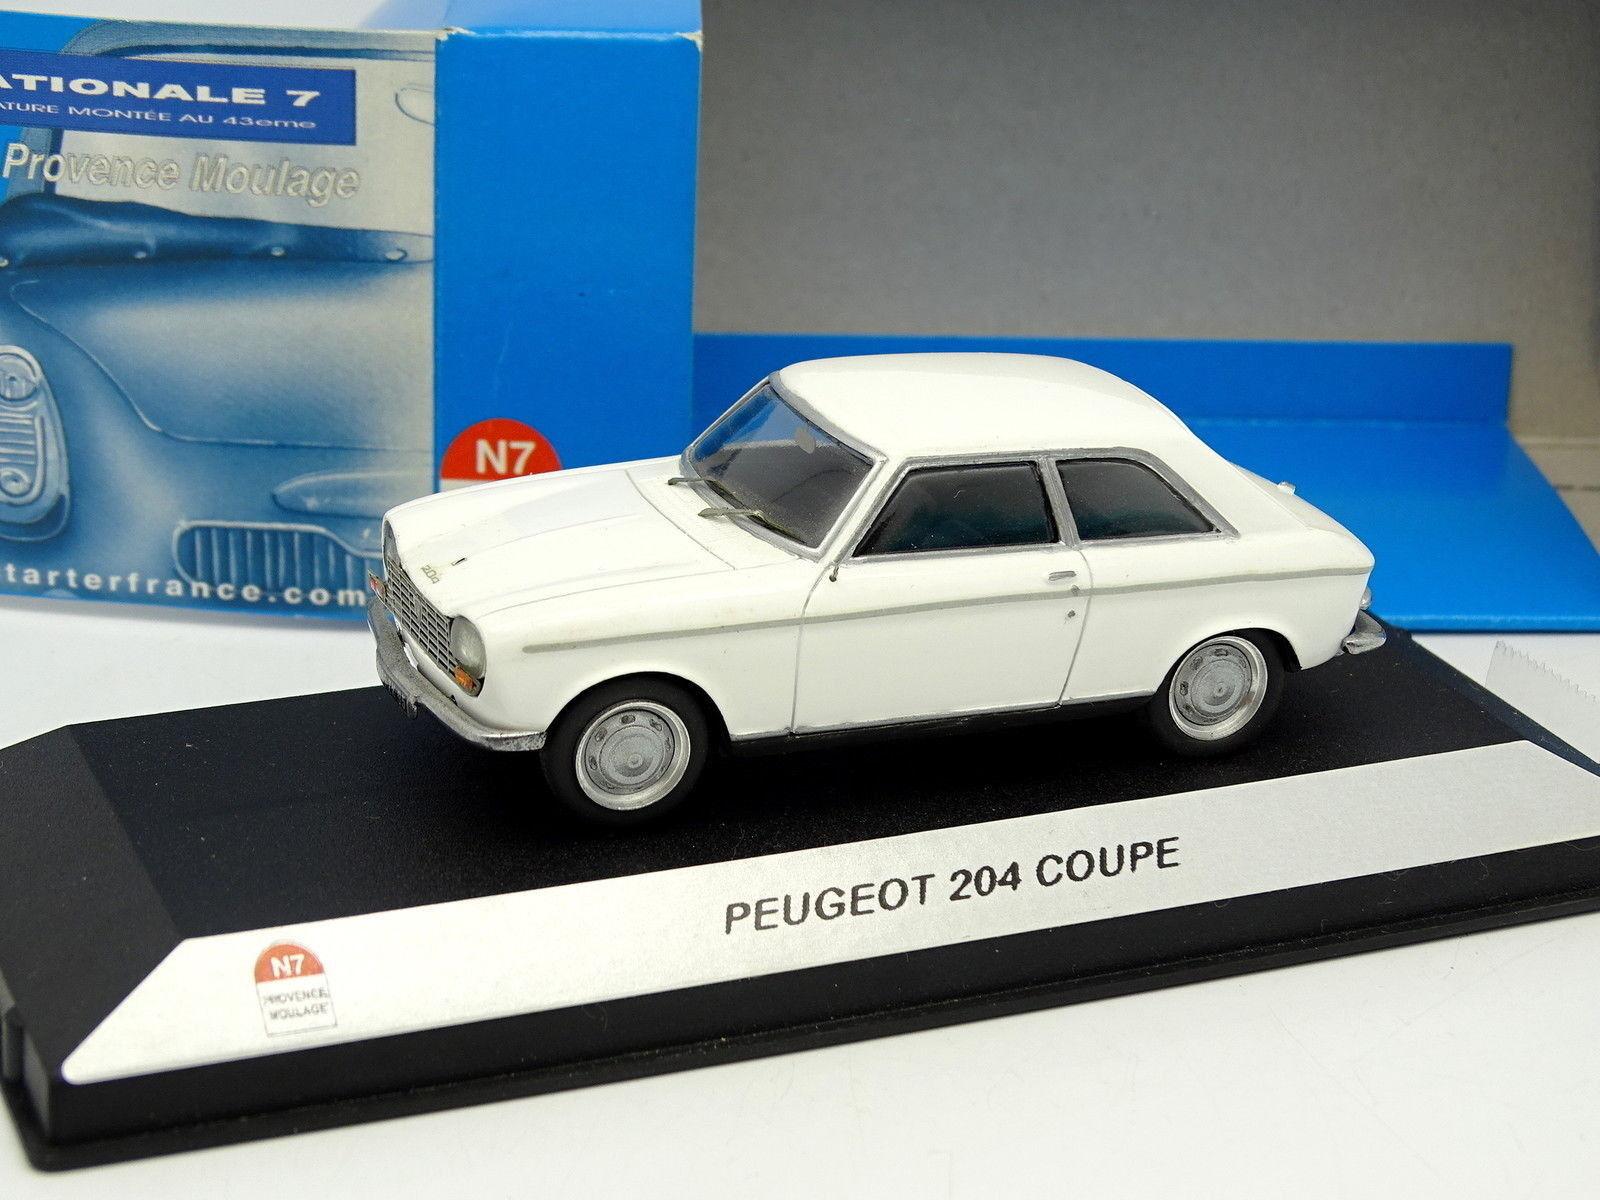 Starter N7 Provence Resina 1 43 - Peugeot 204 Coupé Bianco